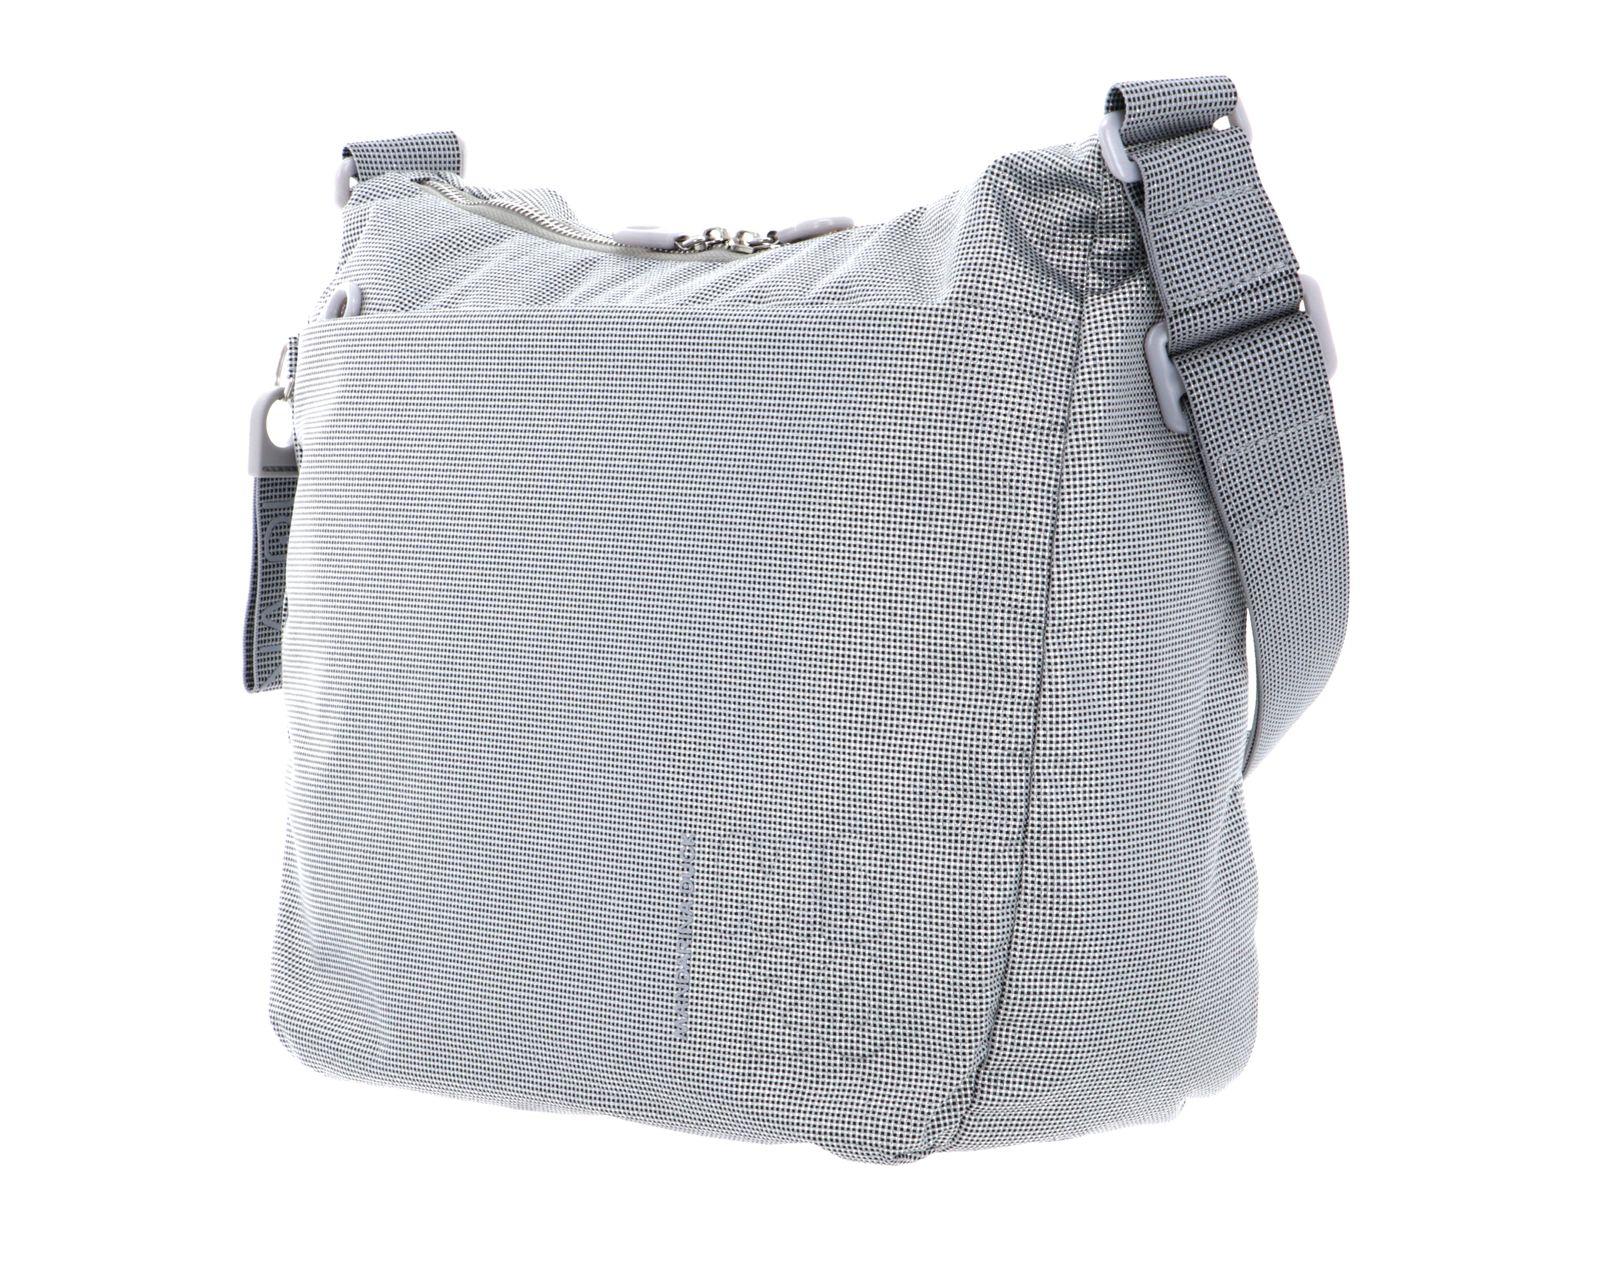 MANDARINA DUCK MD20 Lux Hobo Bag Snow